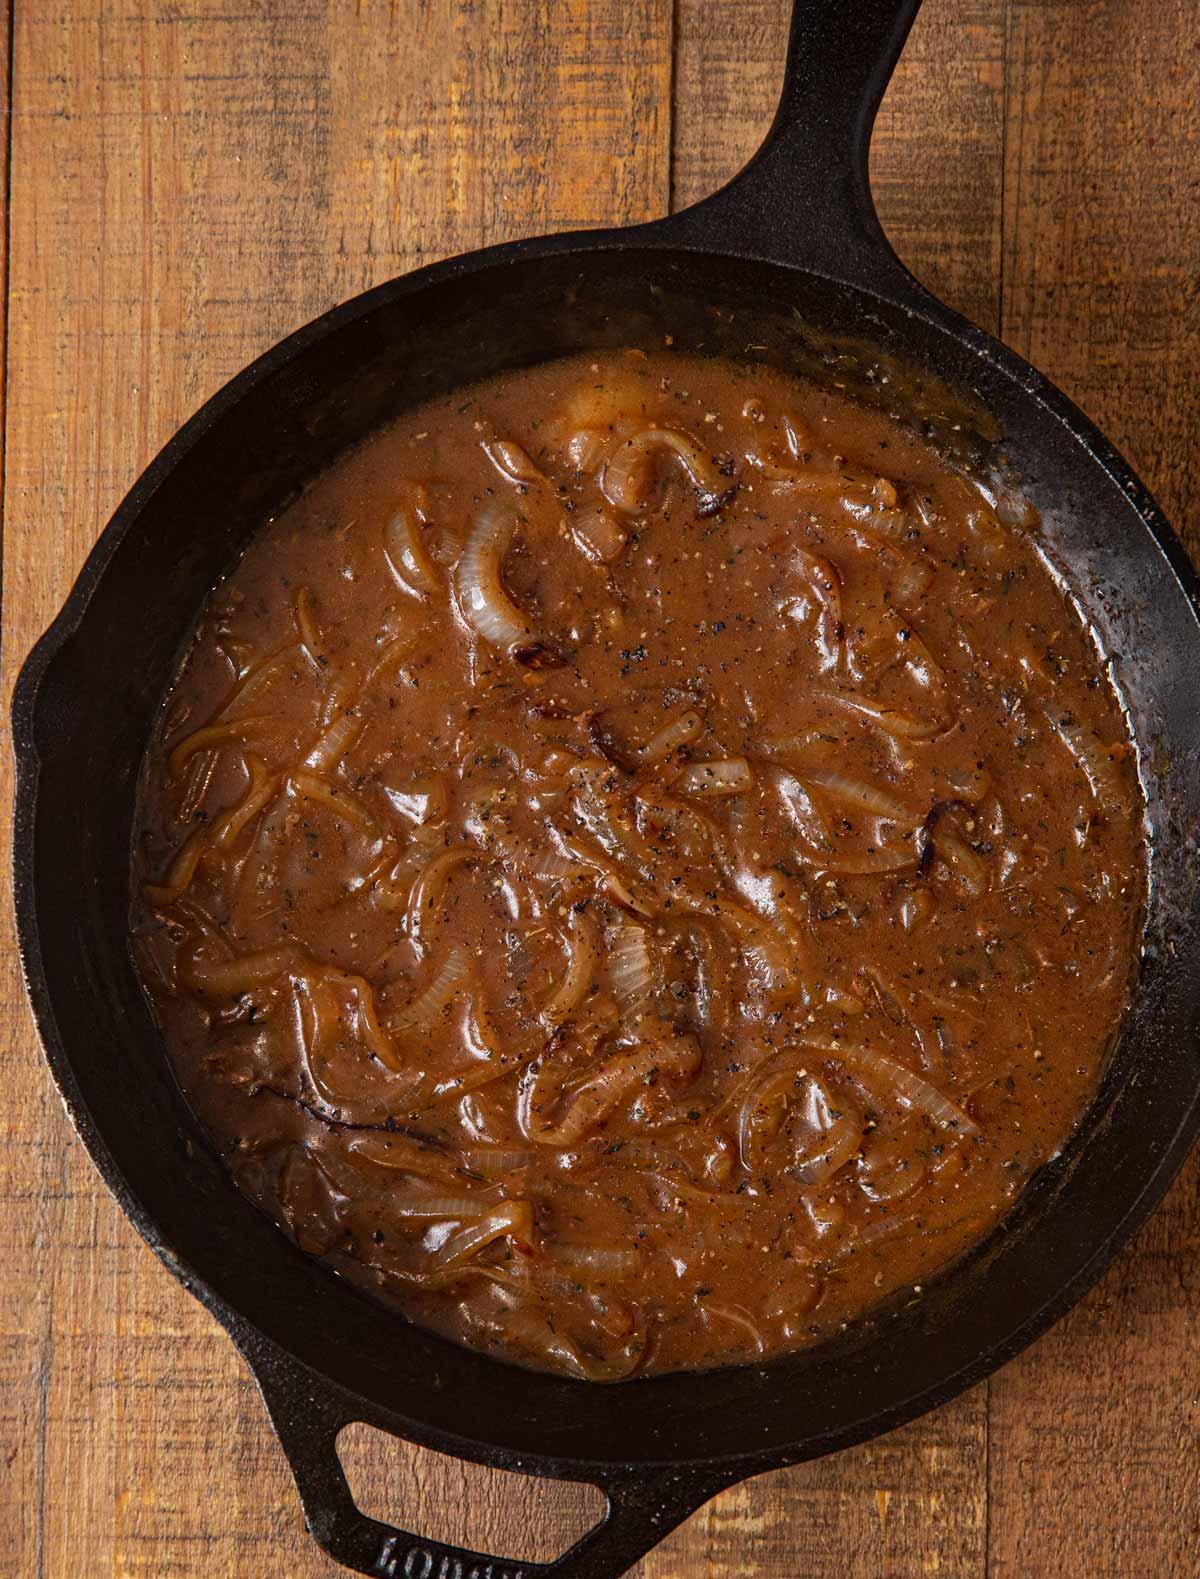 Cube Steak and Gravy gravy in skillet